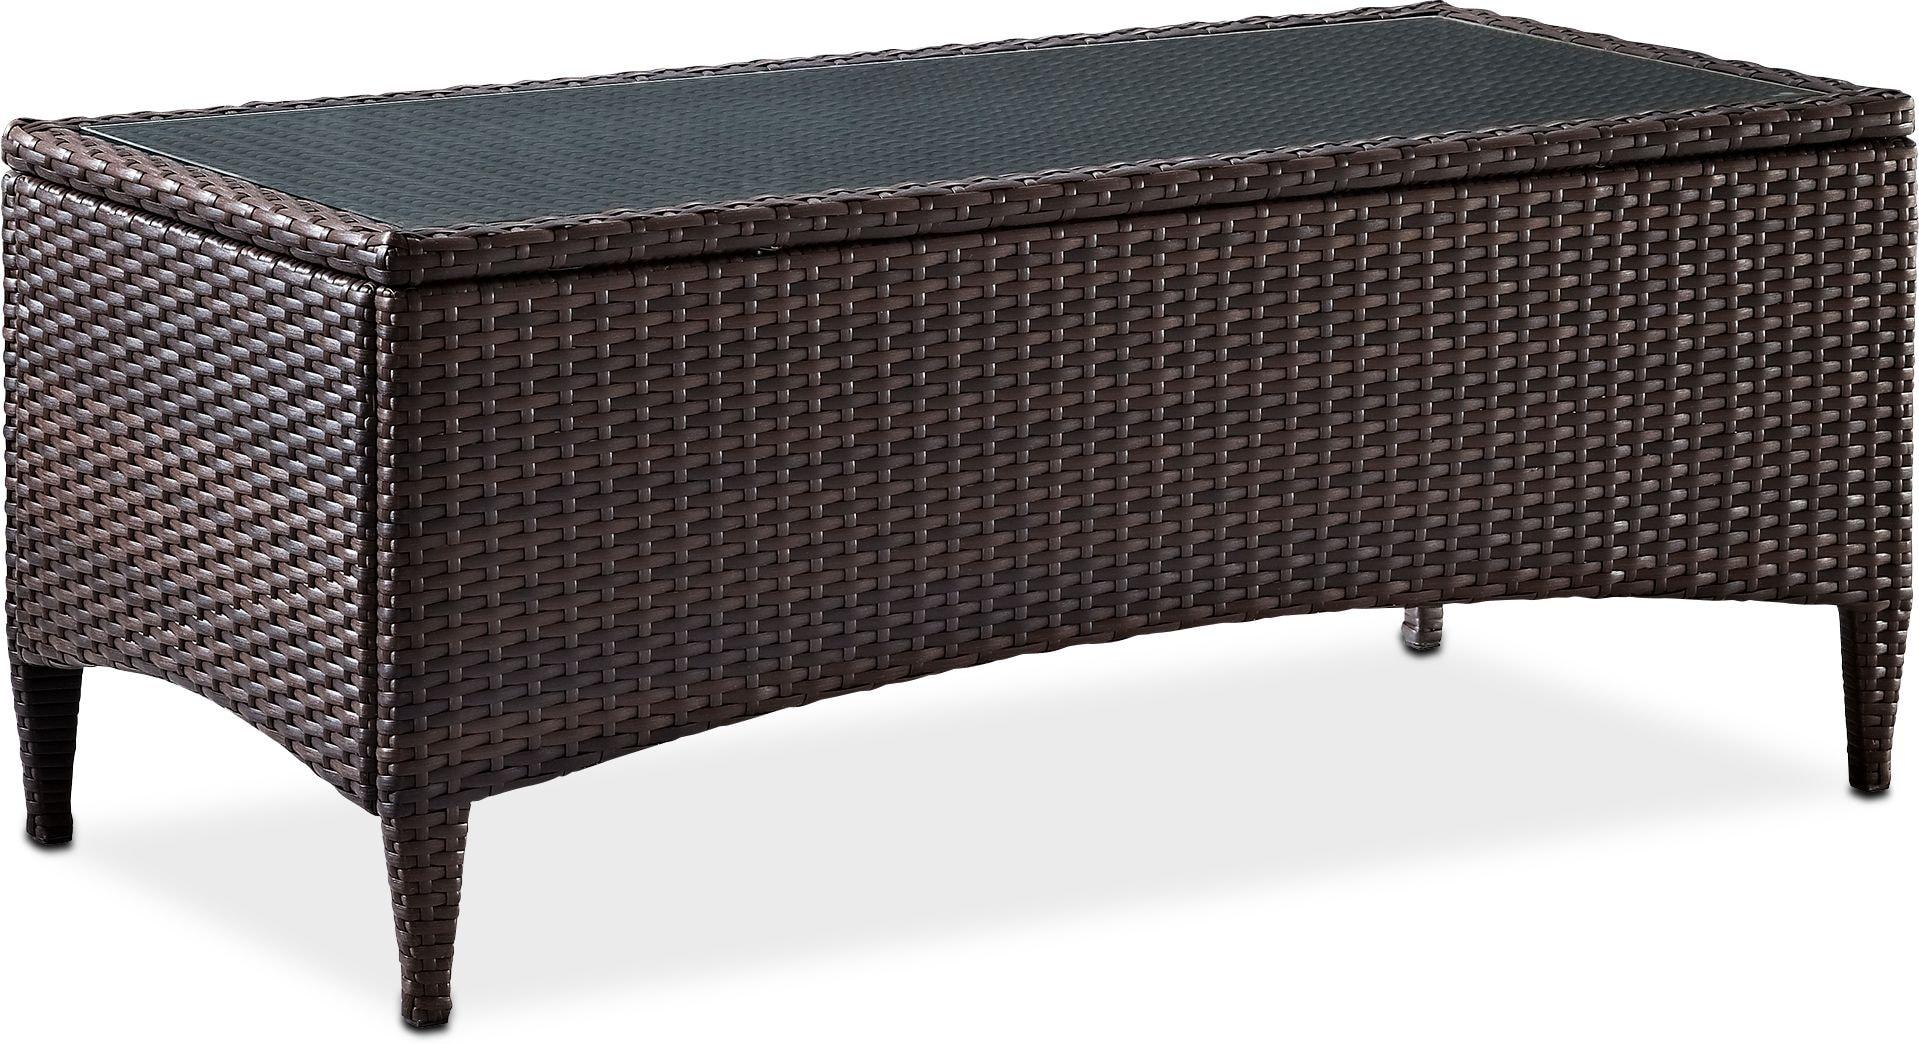 Outdoor Furniture - Corona Outdoor Coffee Table